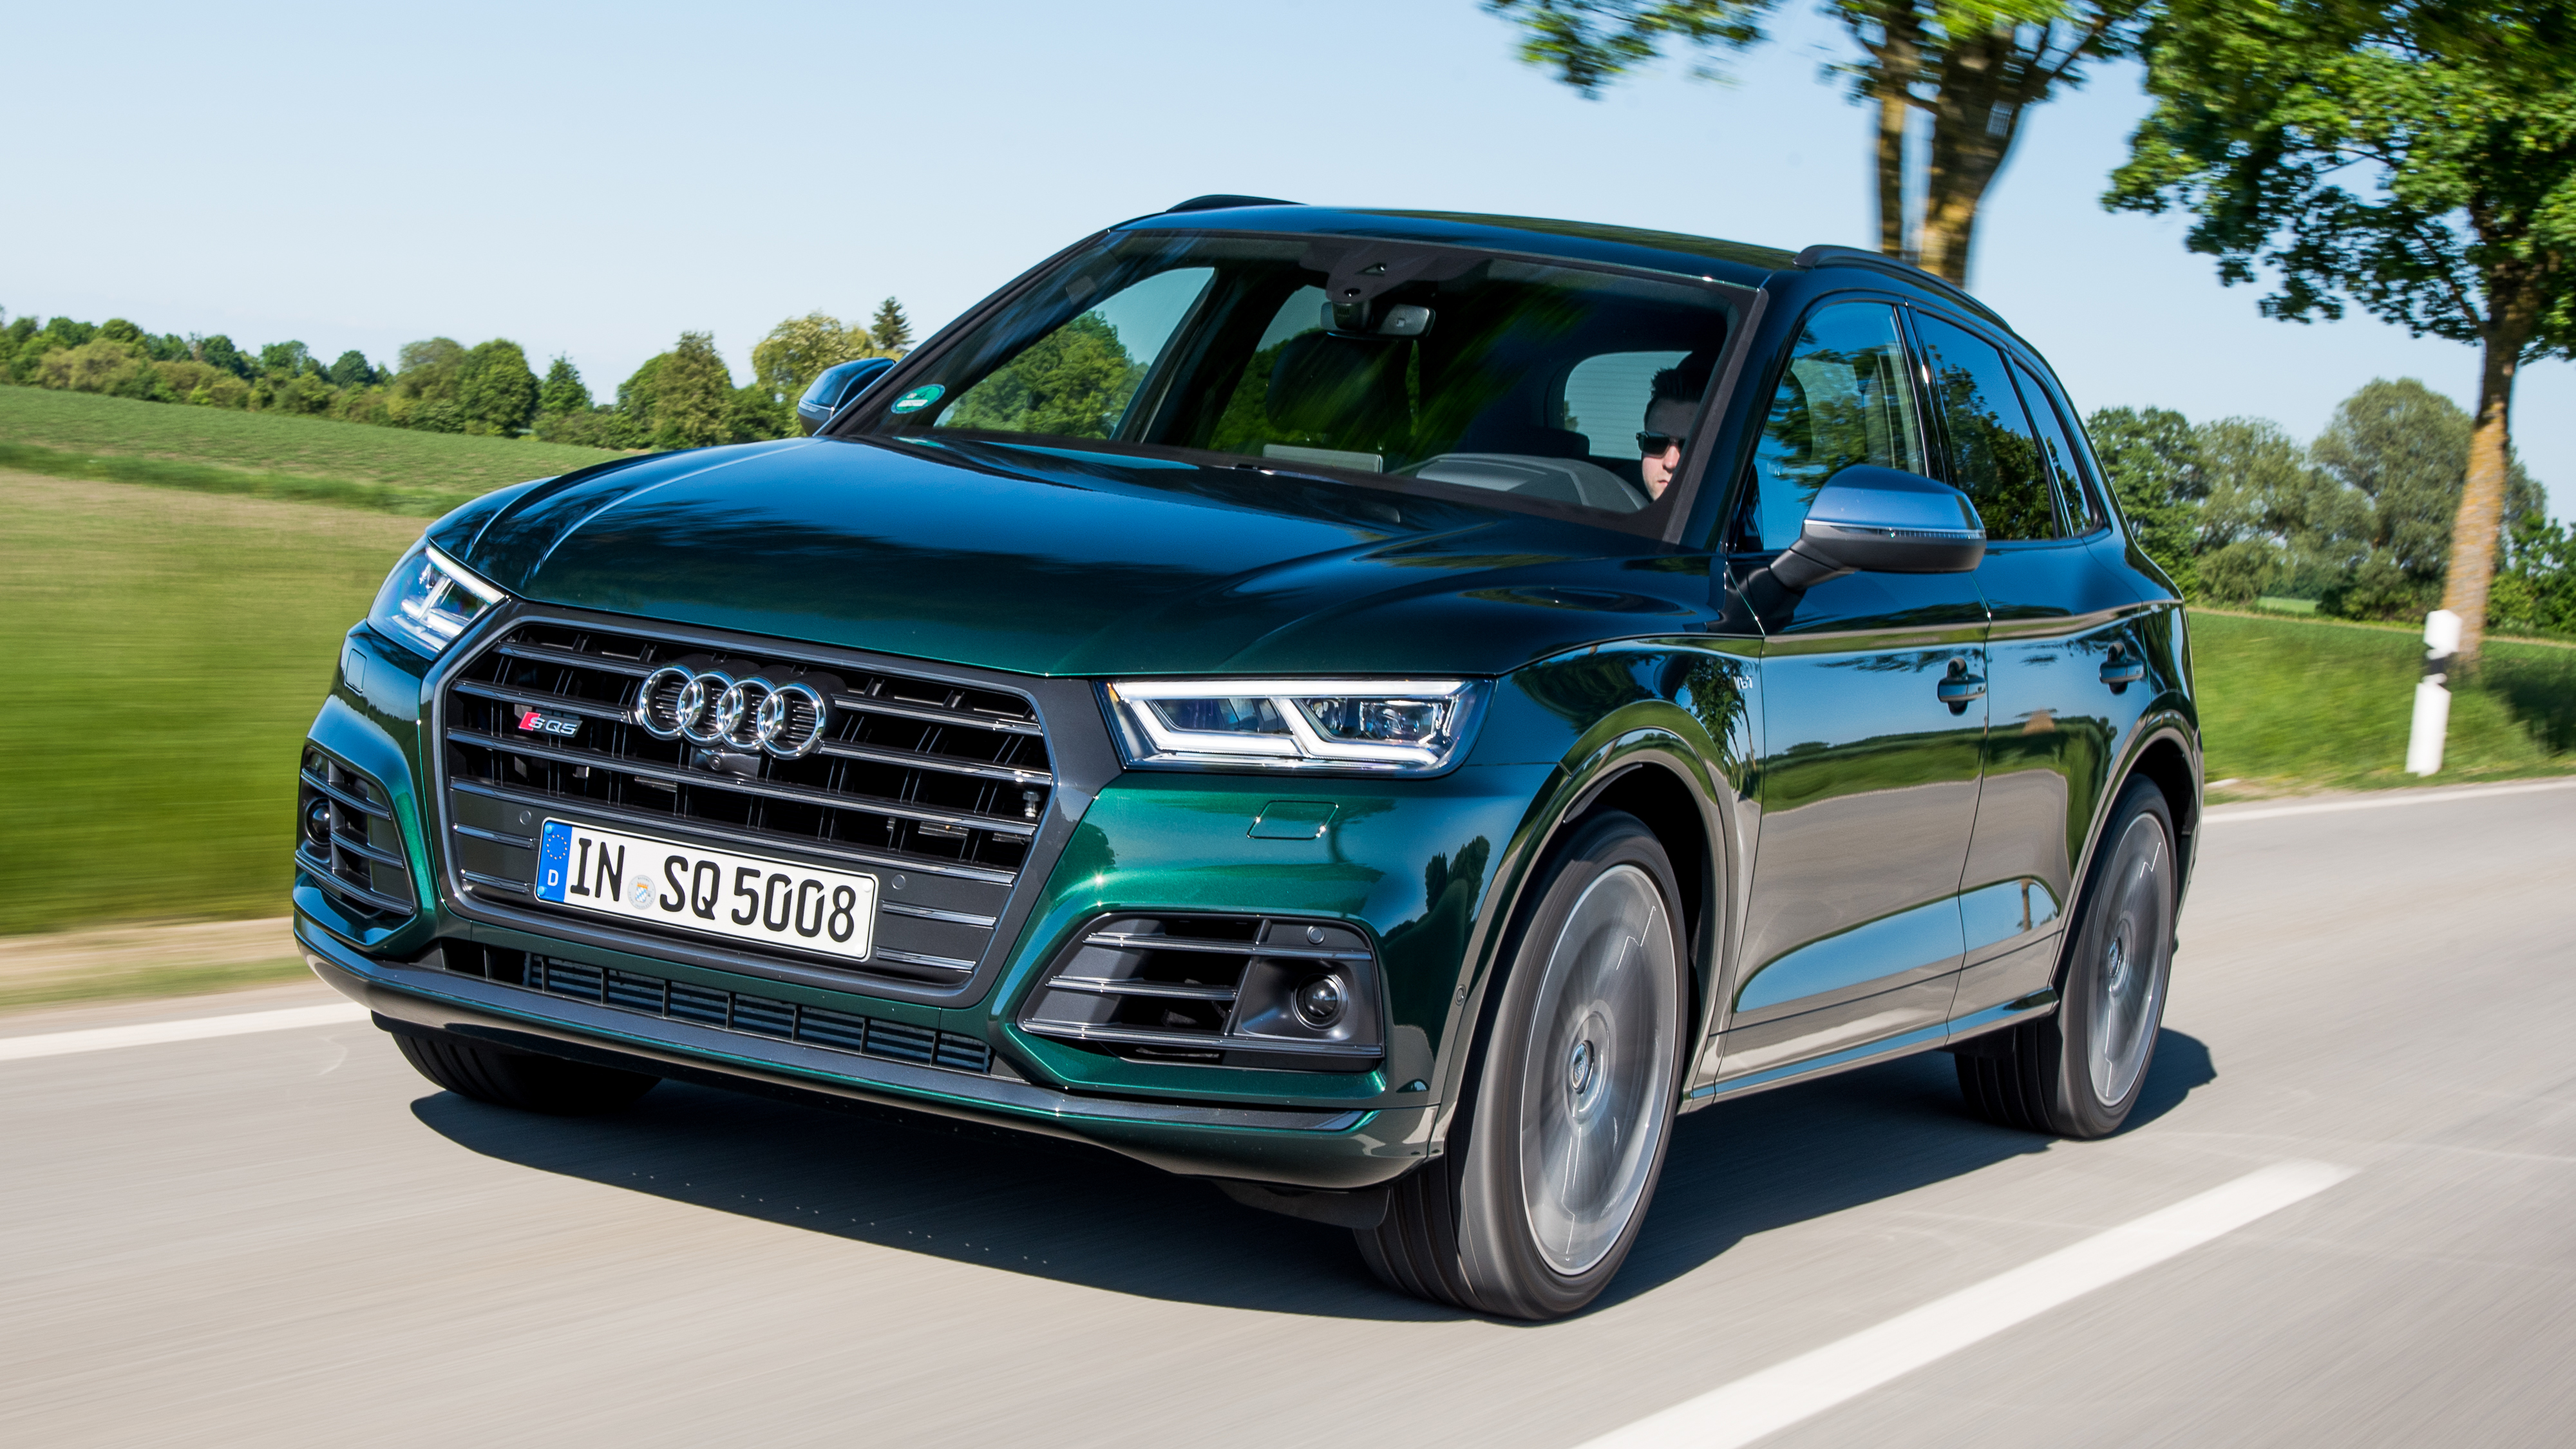 Kelebihan Kekurangan Audi Sq5 2017 Review